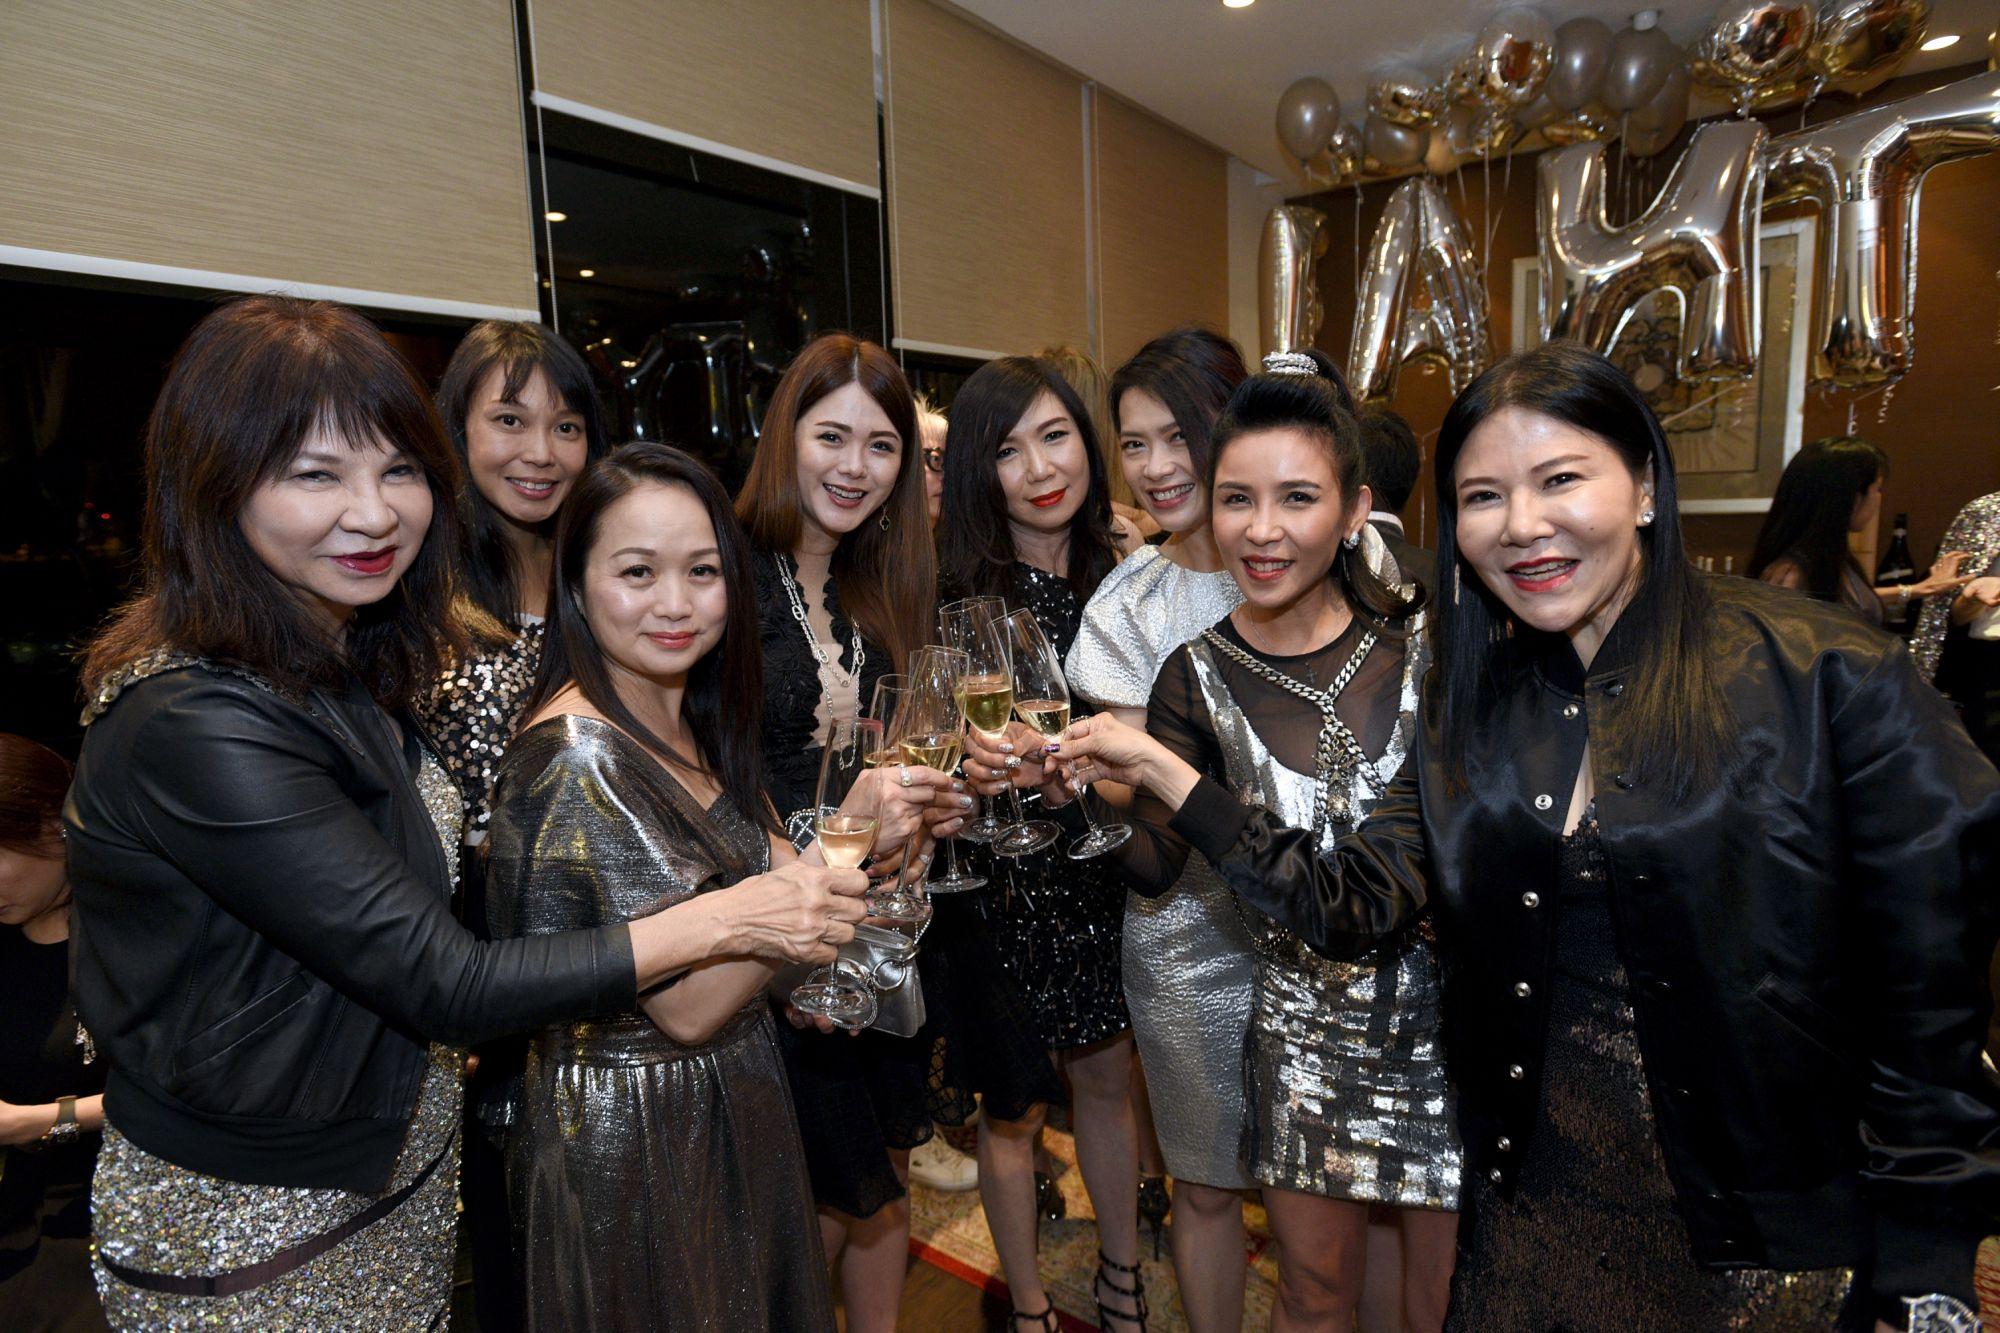 Violet Yeo, Elizabeth Leong, Tonya Tan, Chermaine Pang, Sharon Heng, Ho Ching Lin, Fanty Soenardy, Jane Heng